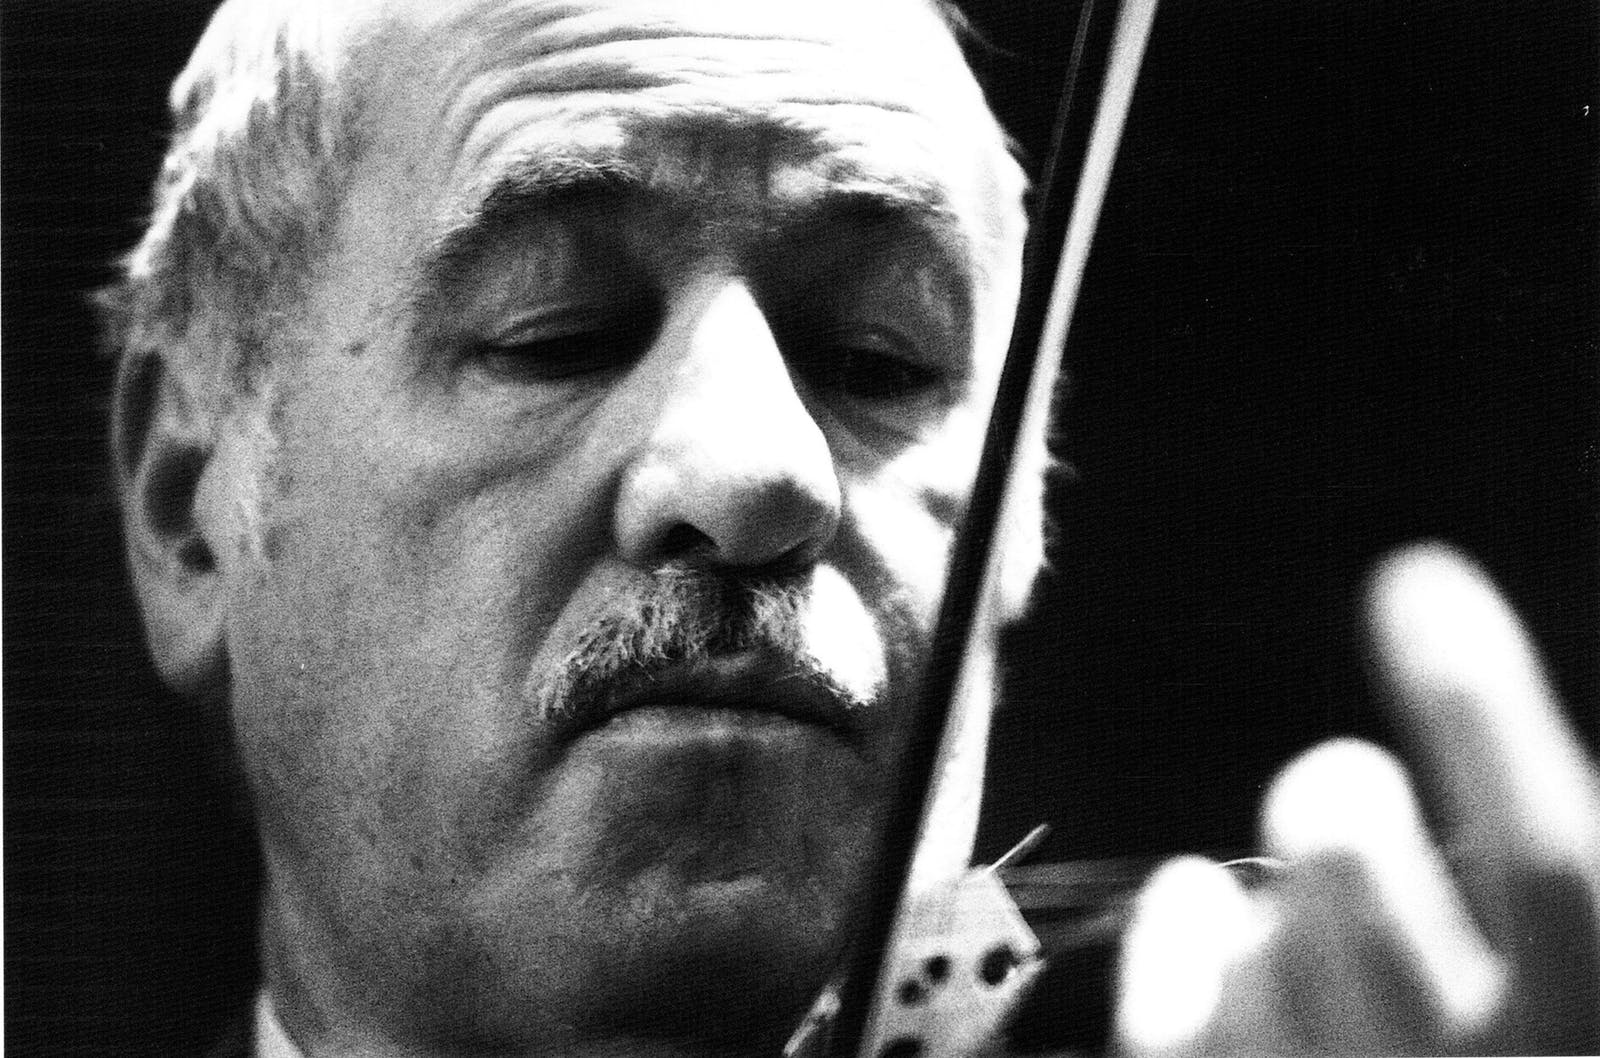 Death of eminent violinist, 93